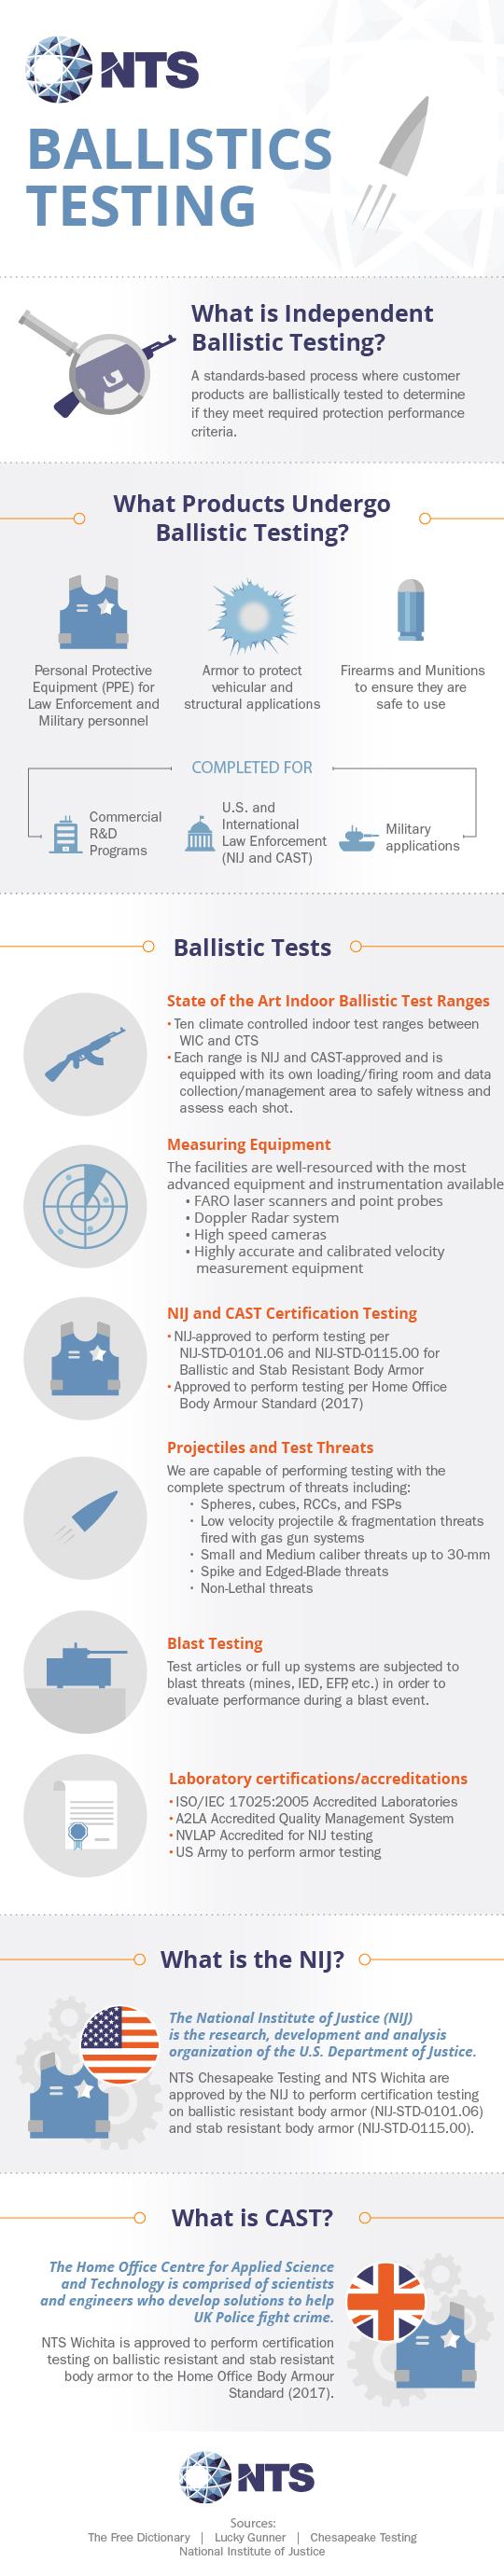 ballistics testing